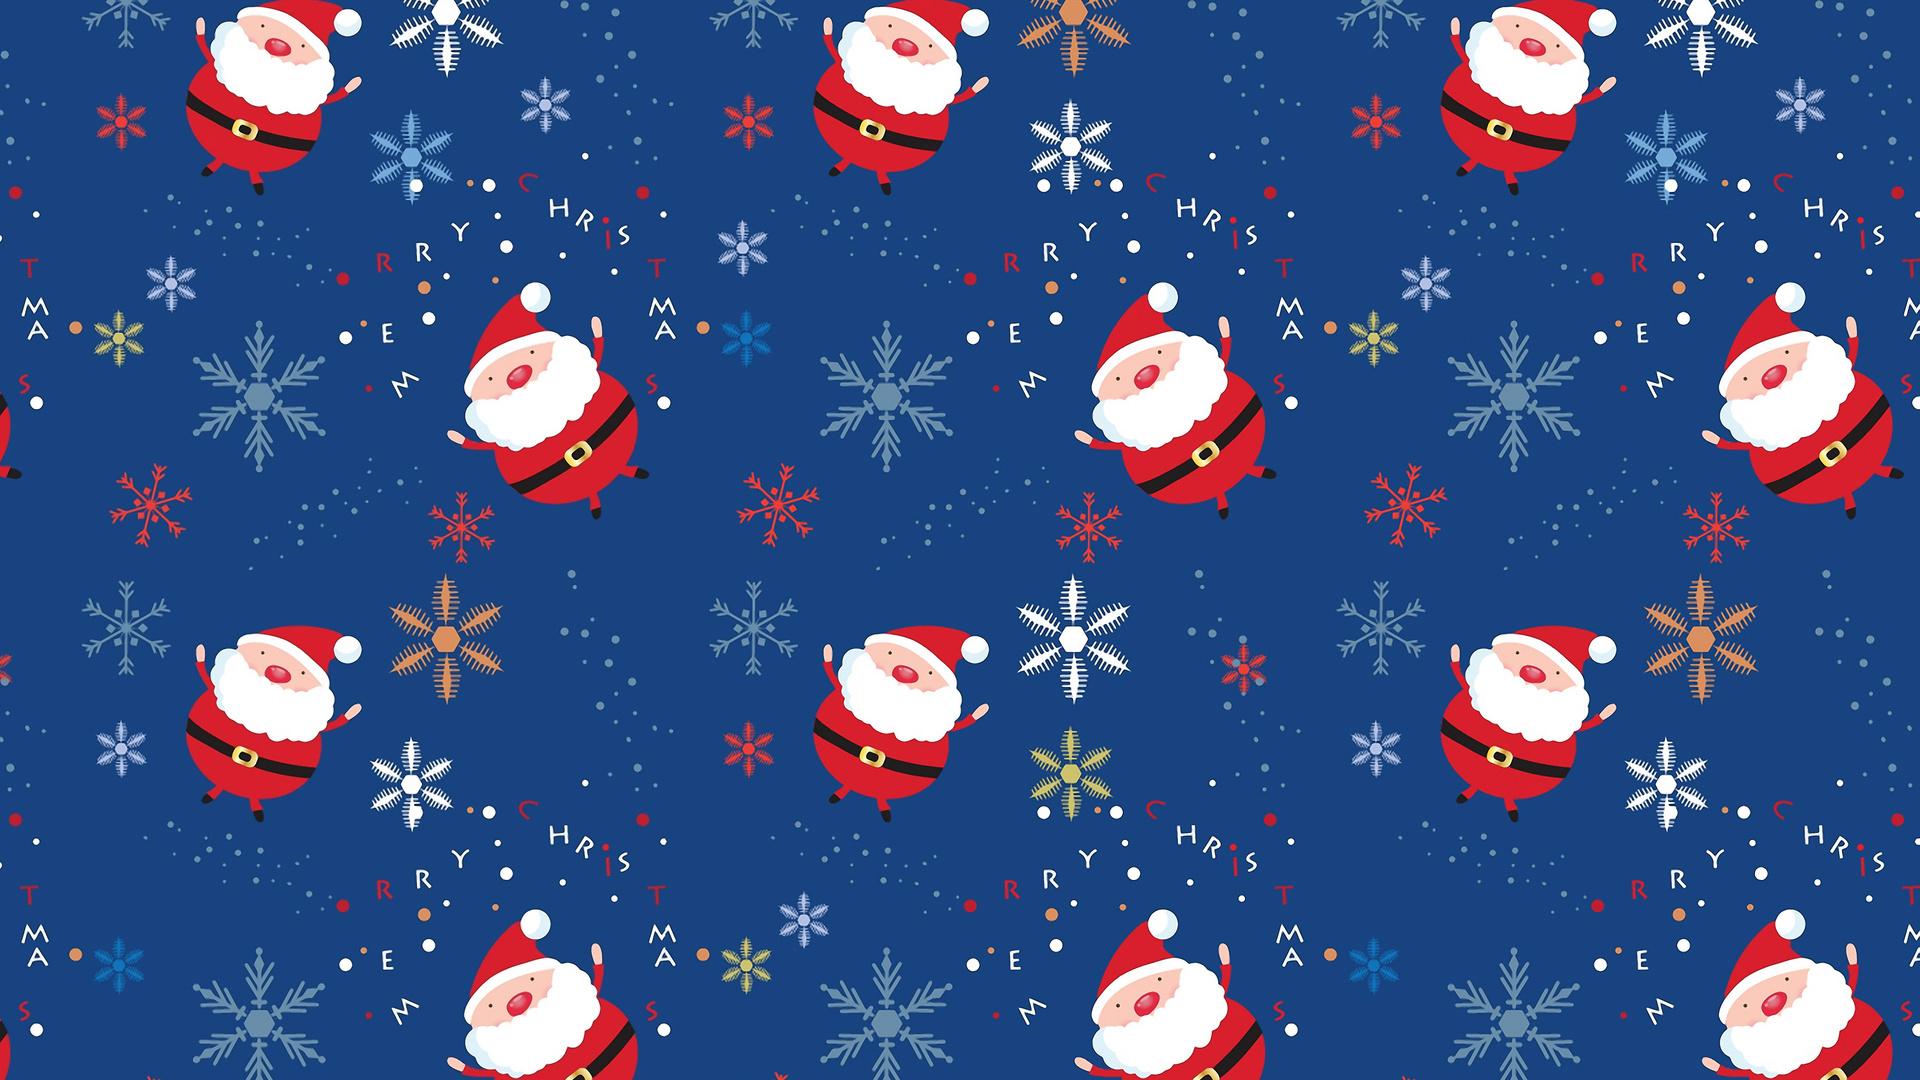 Cute Christmas Backgrounds Download Free | PixelsTalk.Net